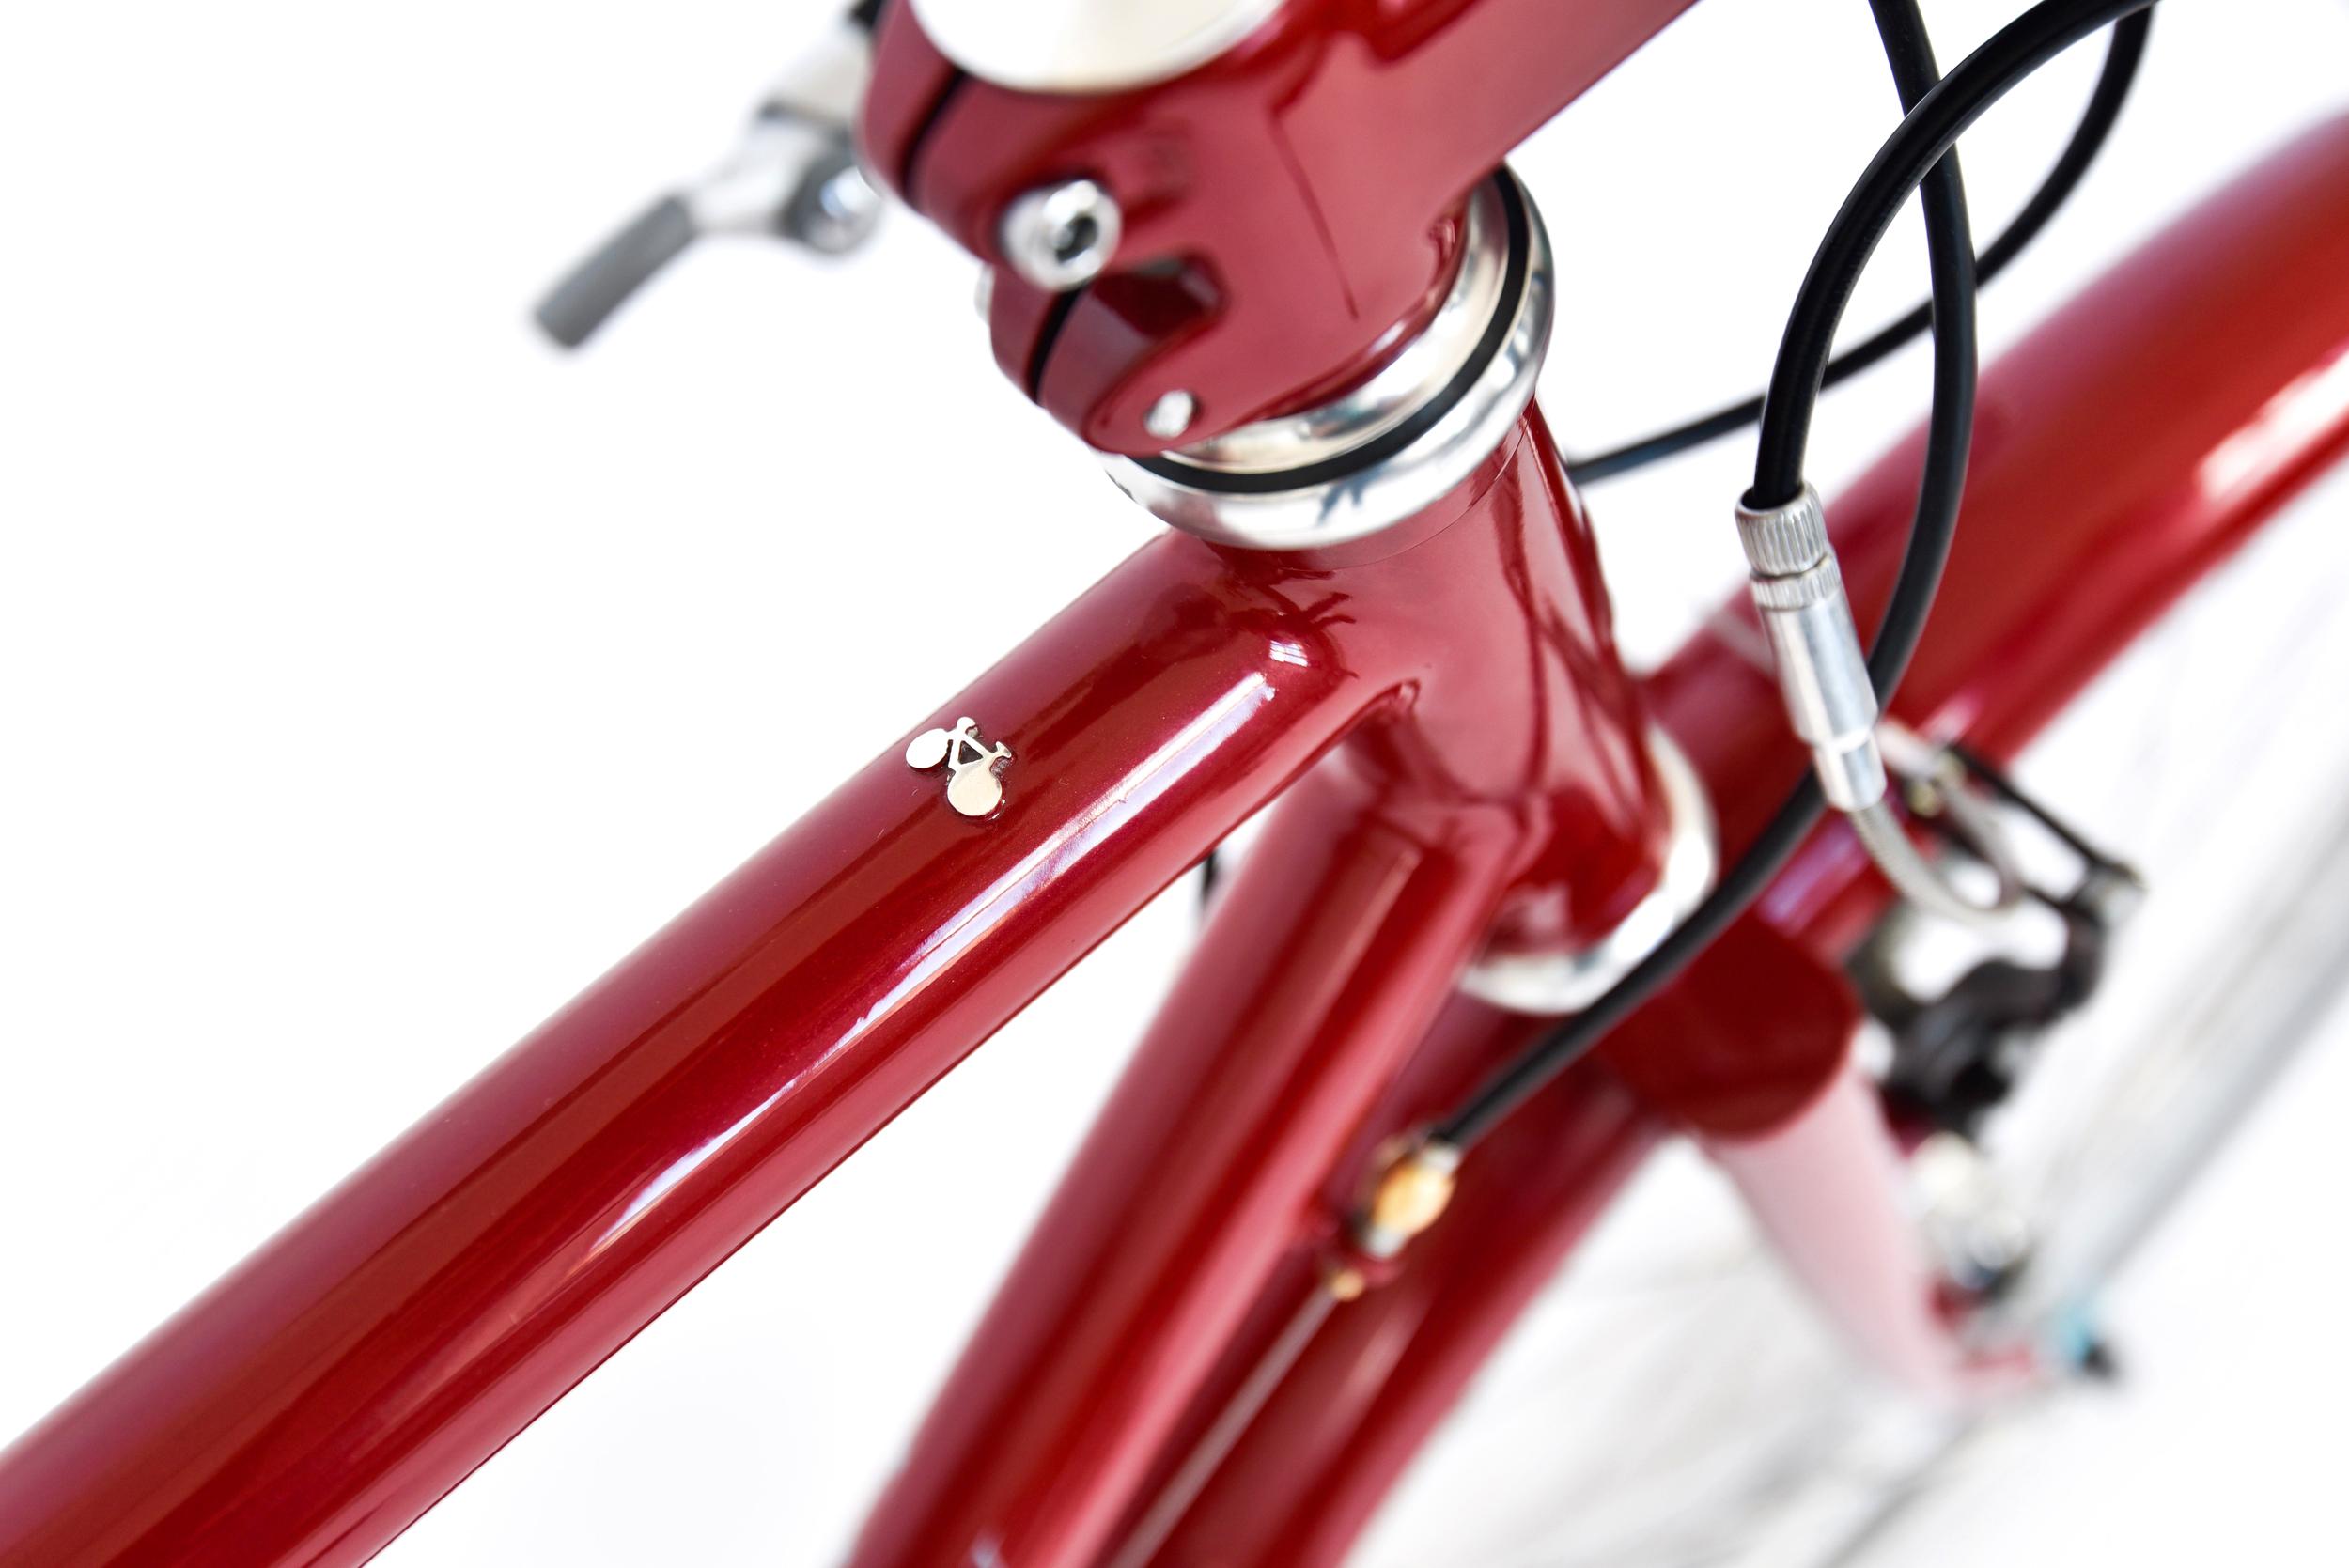 853 mini tourer mini silver bicycle.jpg